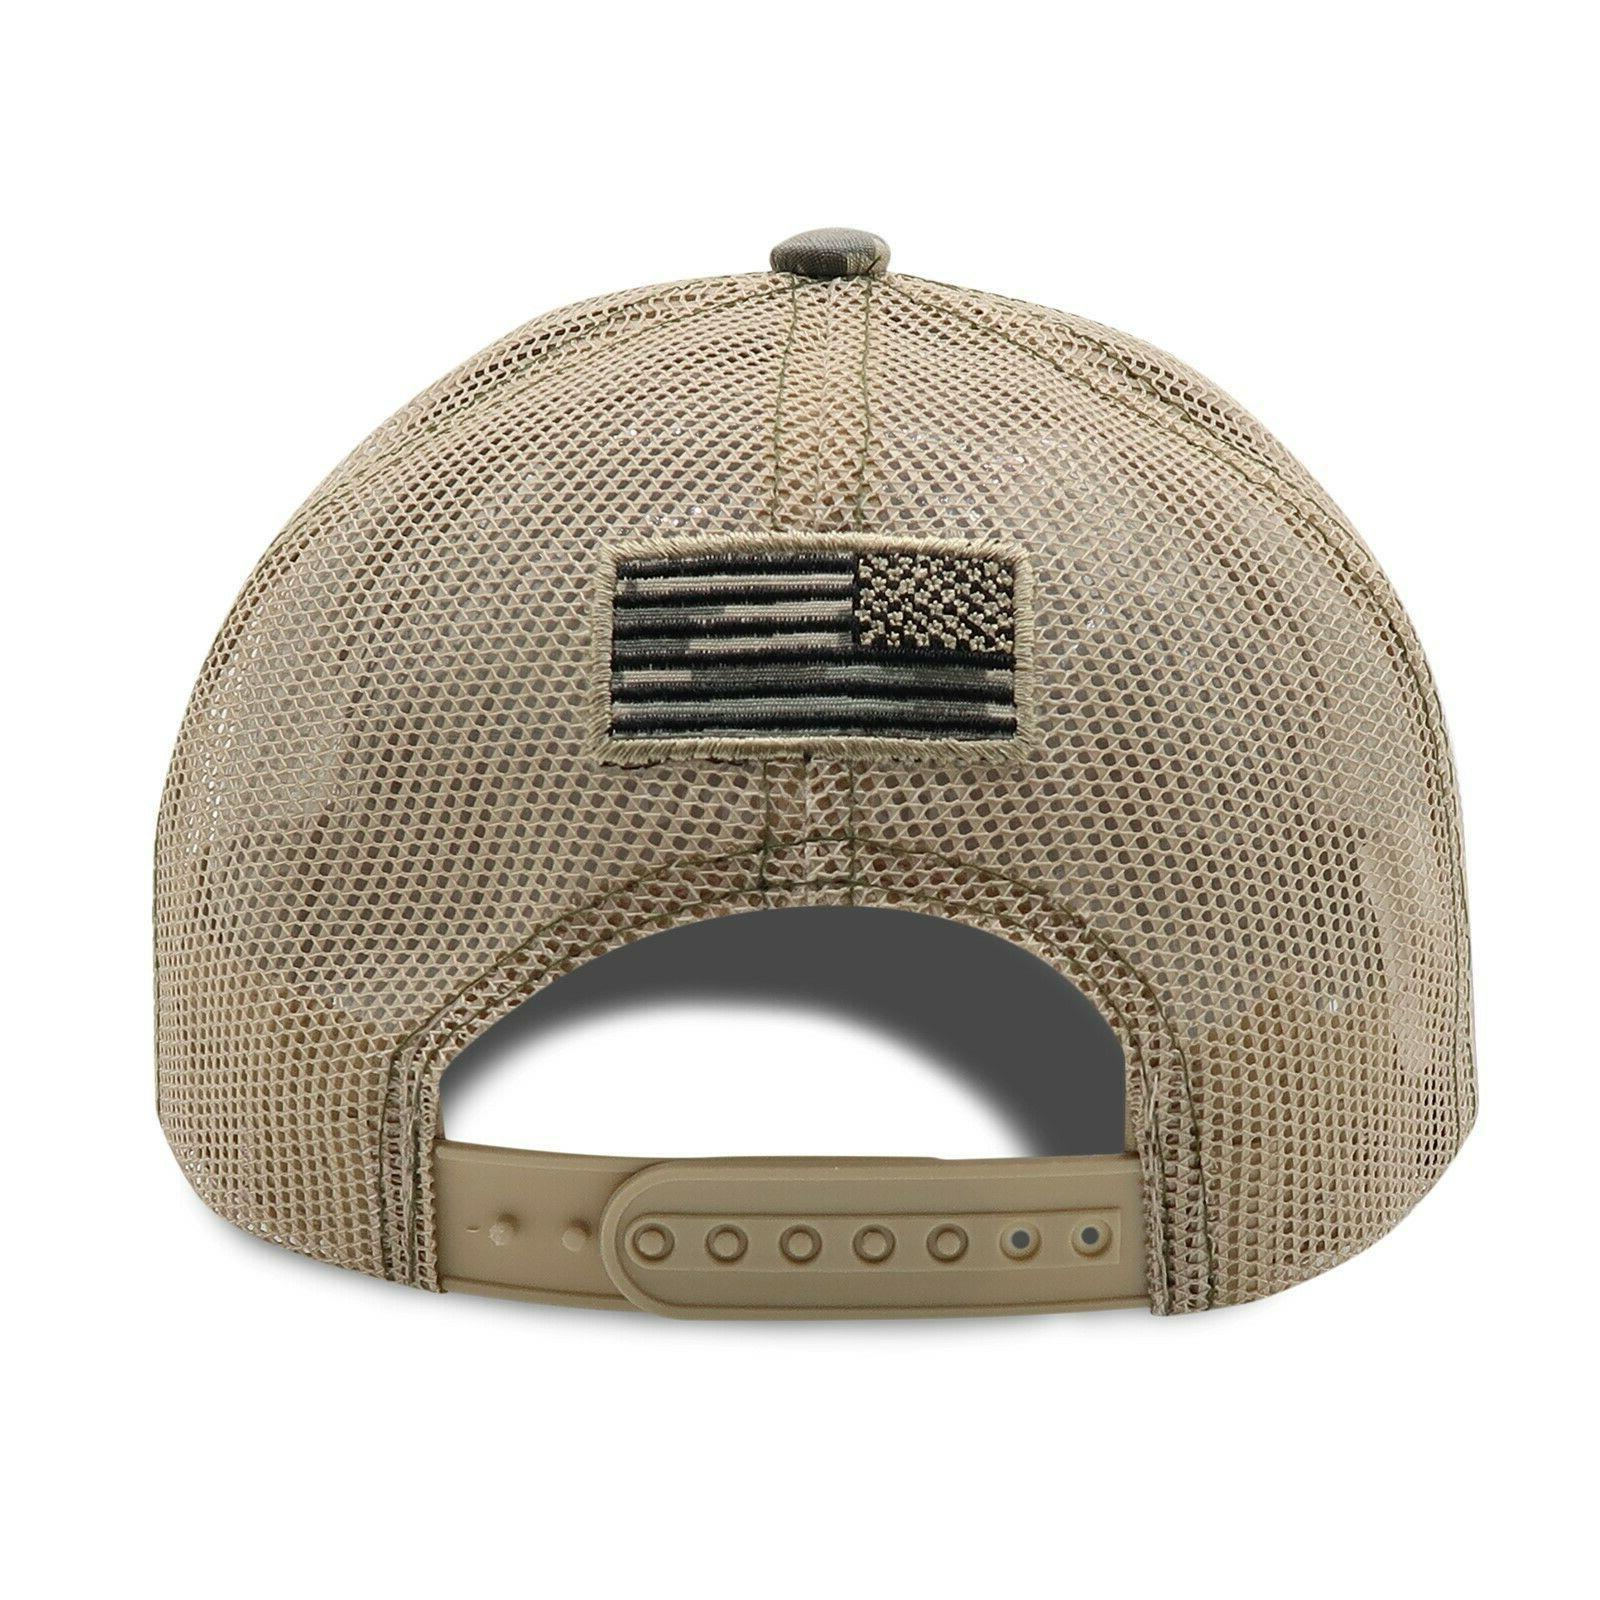 Mens Cotton Baseball USA Army American Tactical Trucker Mesh Hat